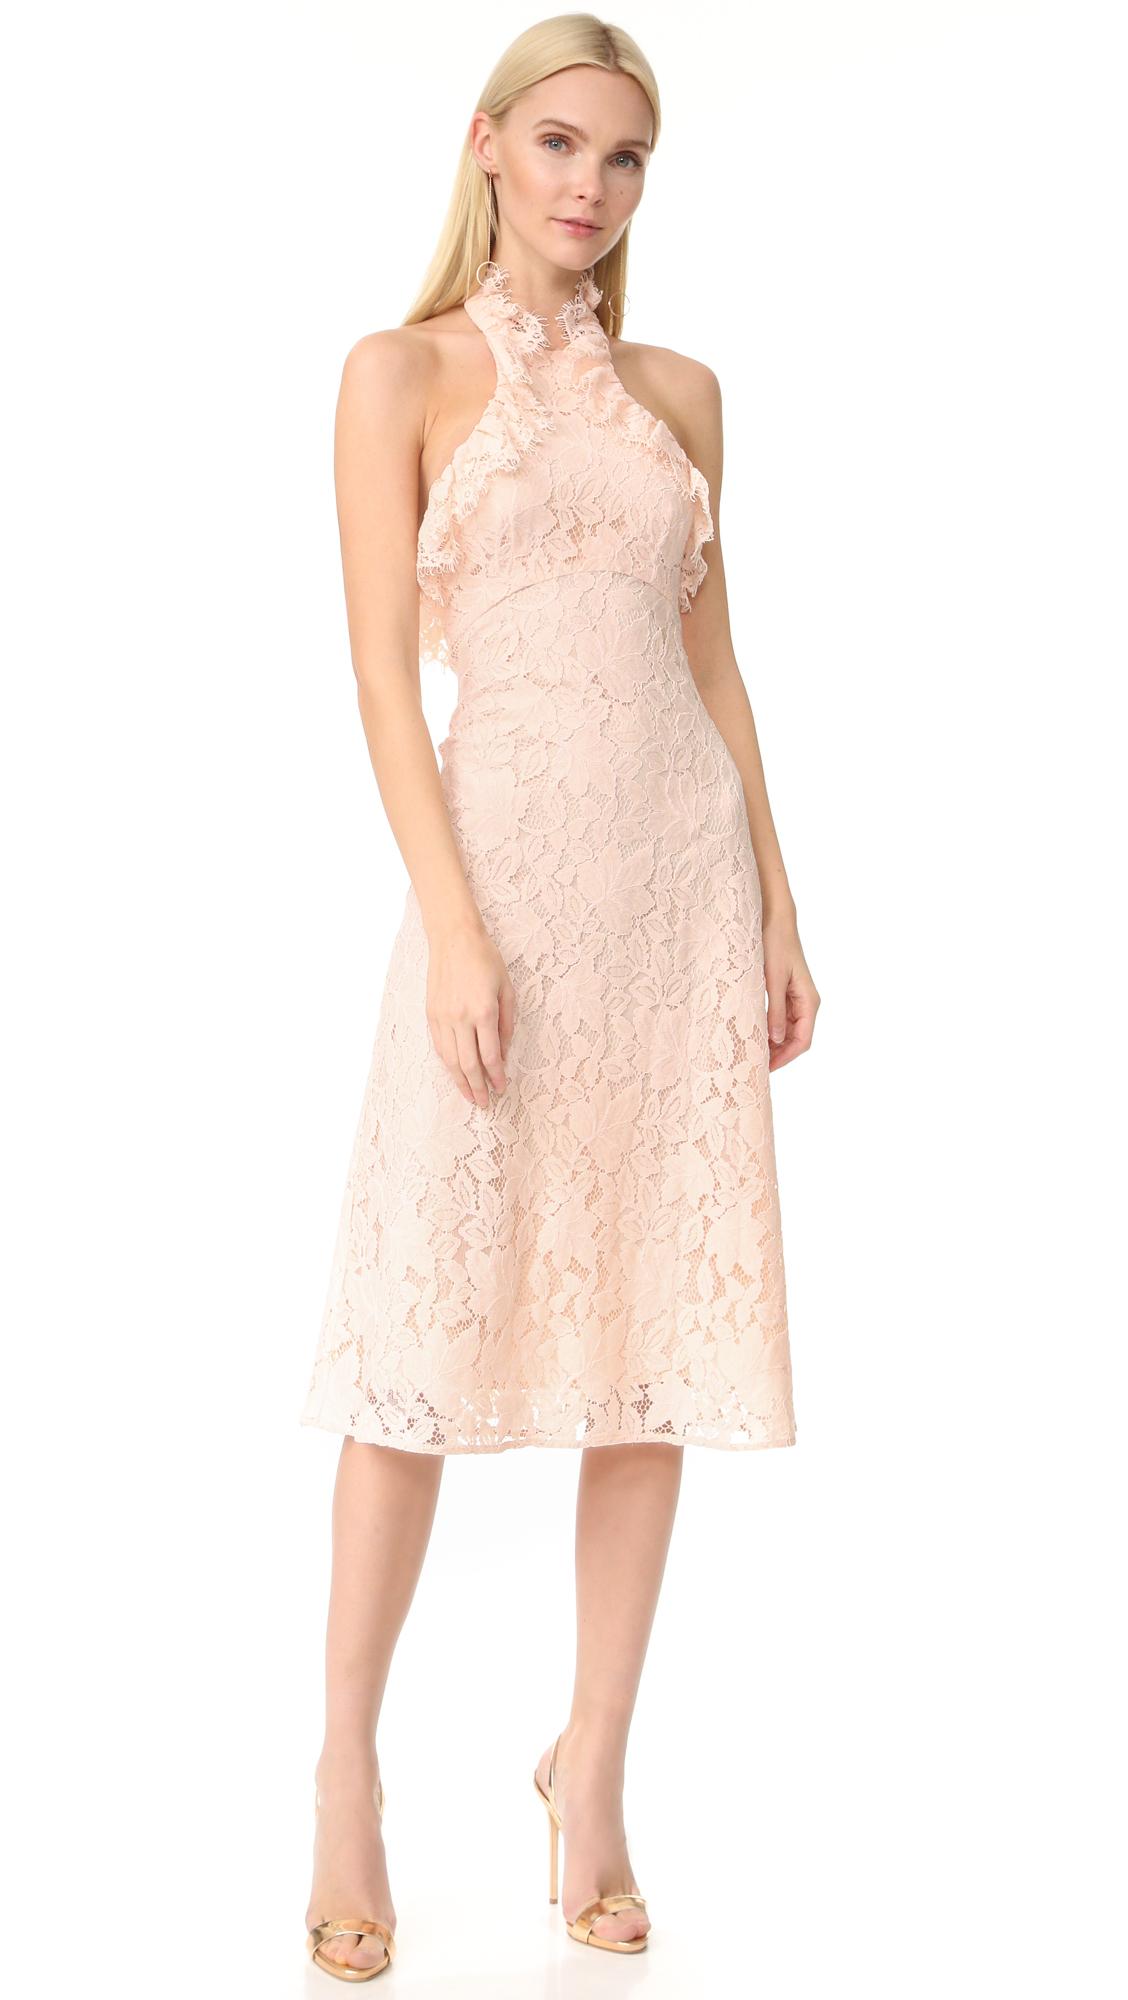 Lover Affinity Ruffle Halter Dress - Tearose